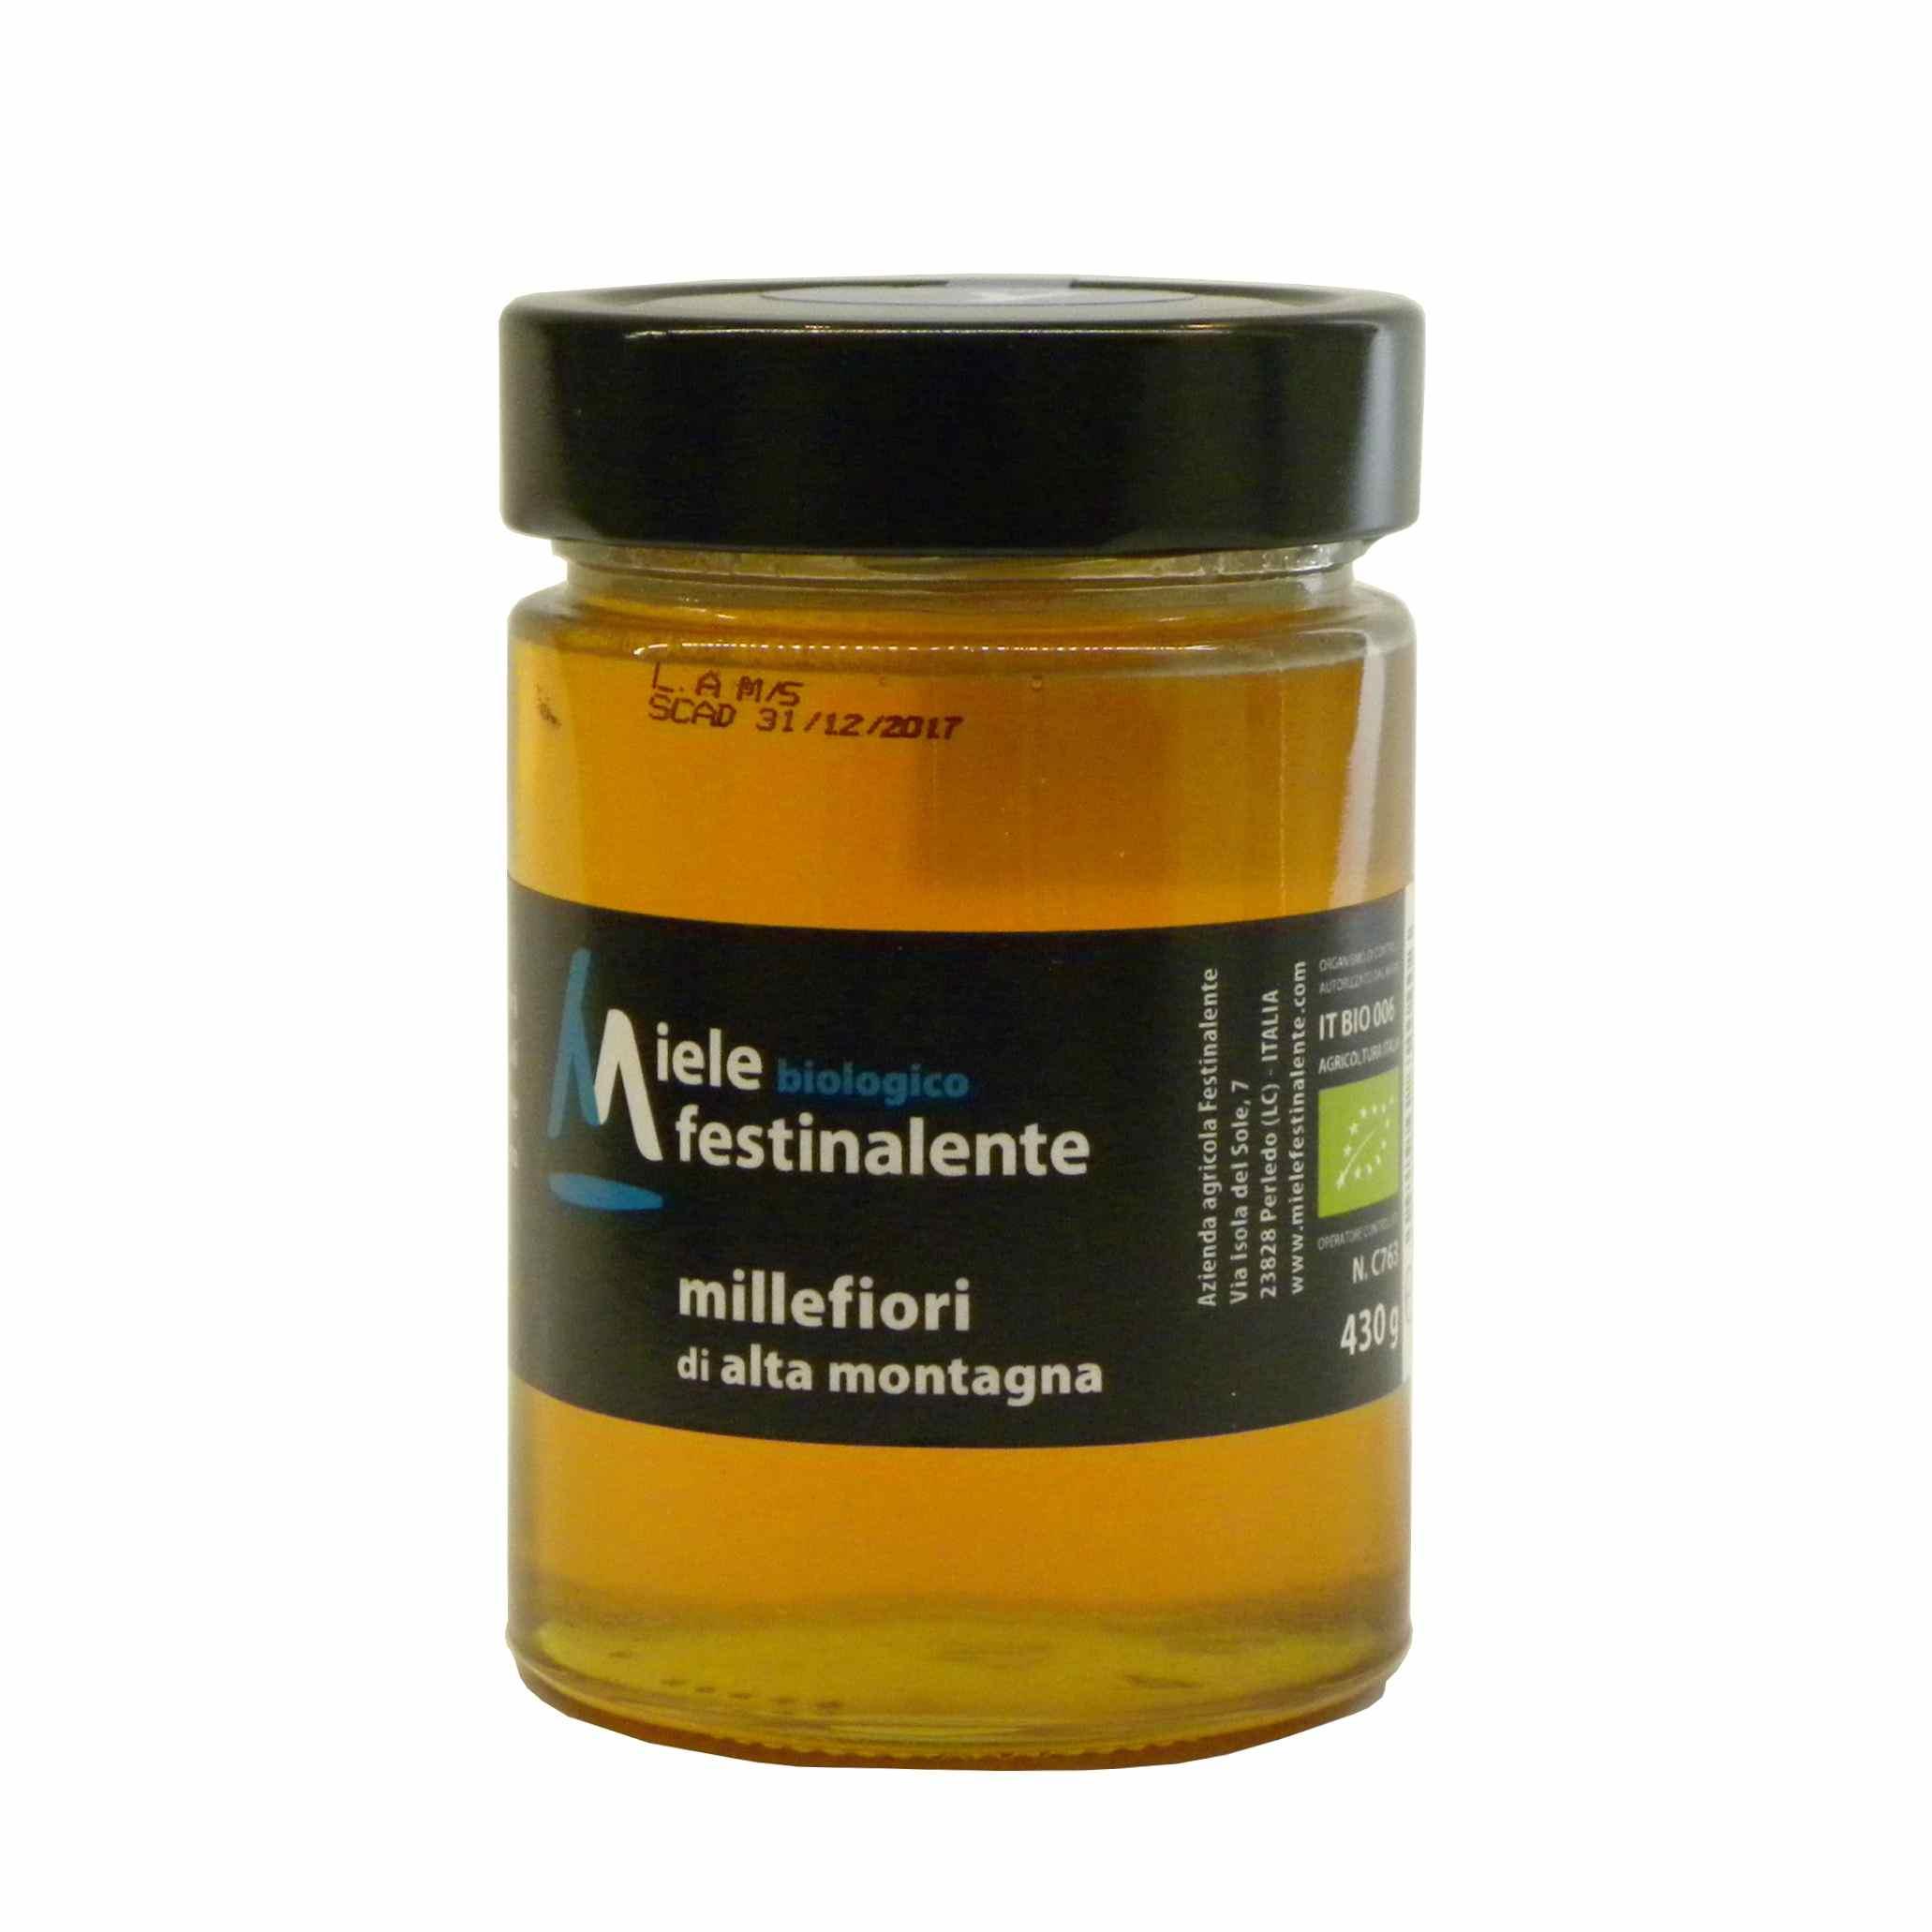 Festinalente miele bio millefiori – Festinalente organic raw mountain thousand flowers honey – Gustorotondo – Italian food boutique